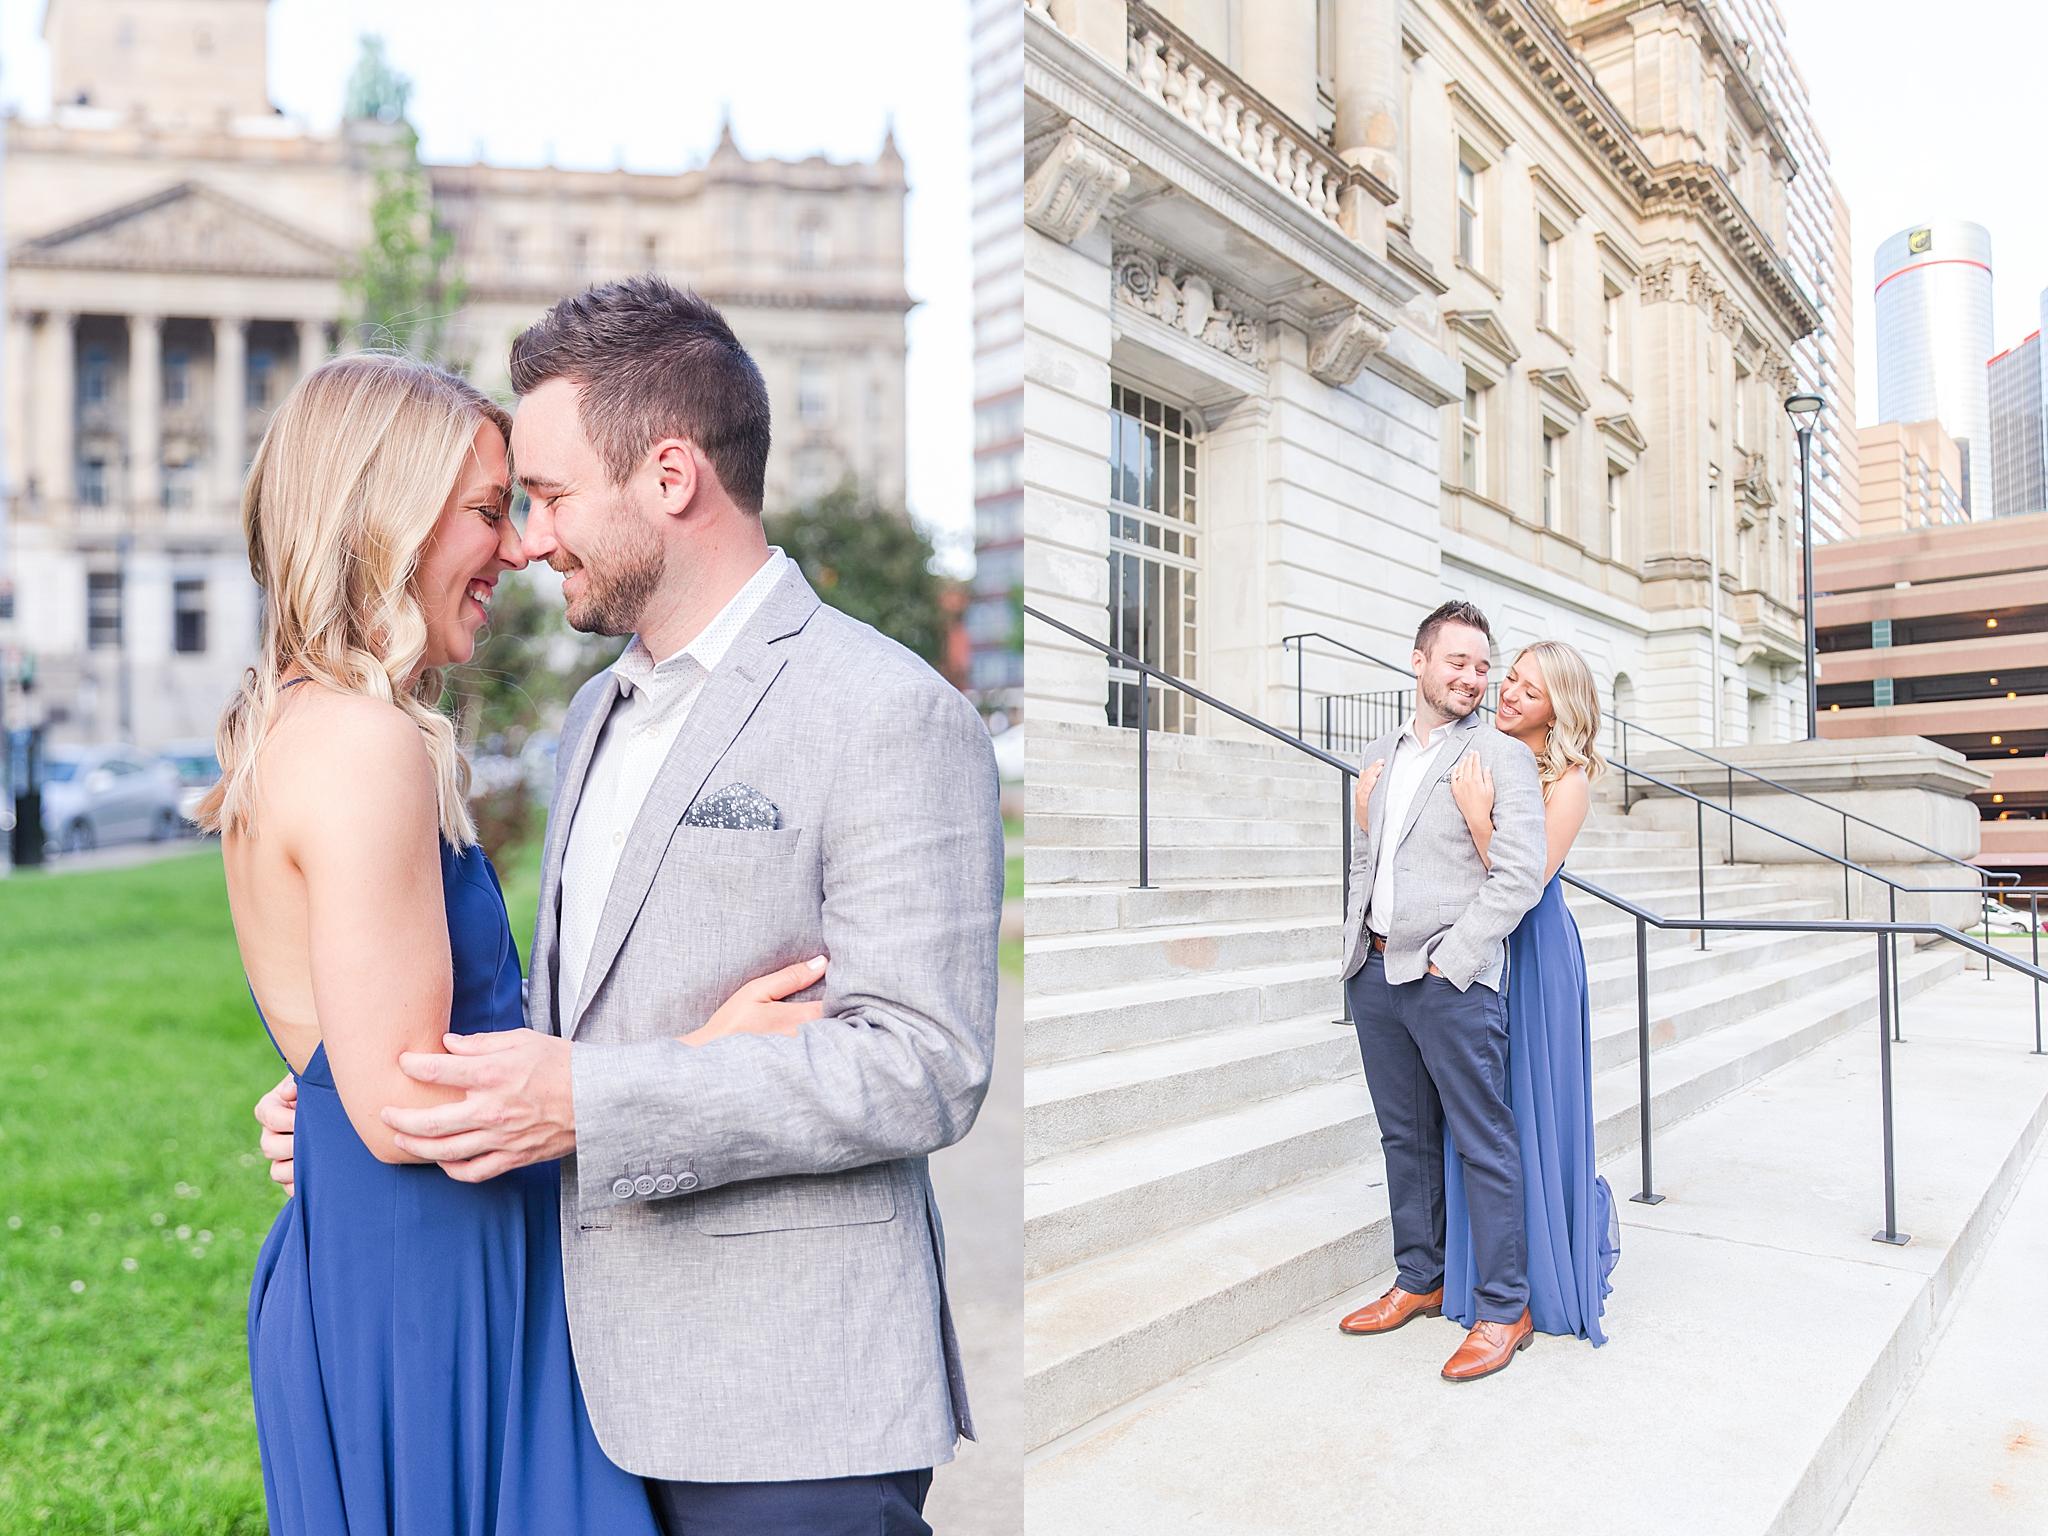 detroit-wedding-photographer-downtown-detroit-belle-isle-engagement-photos-sarah-eric-by-courtney-carolyn-photography_0029.jpg